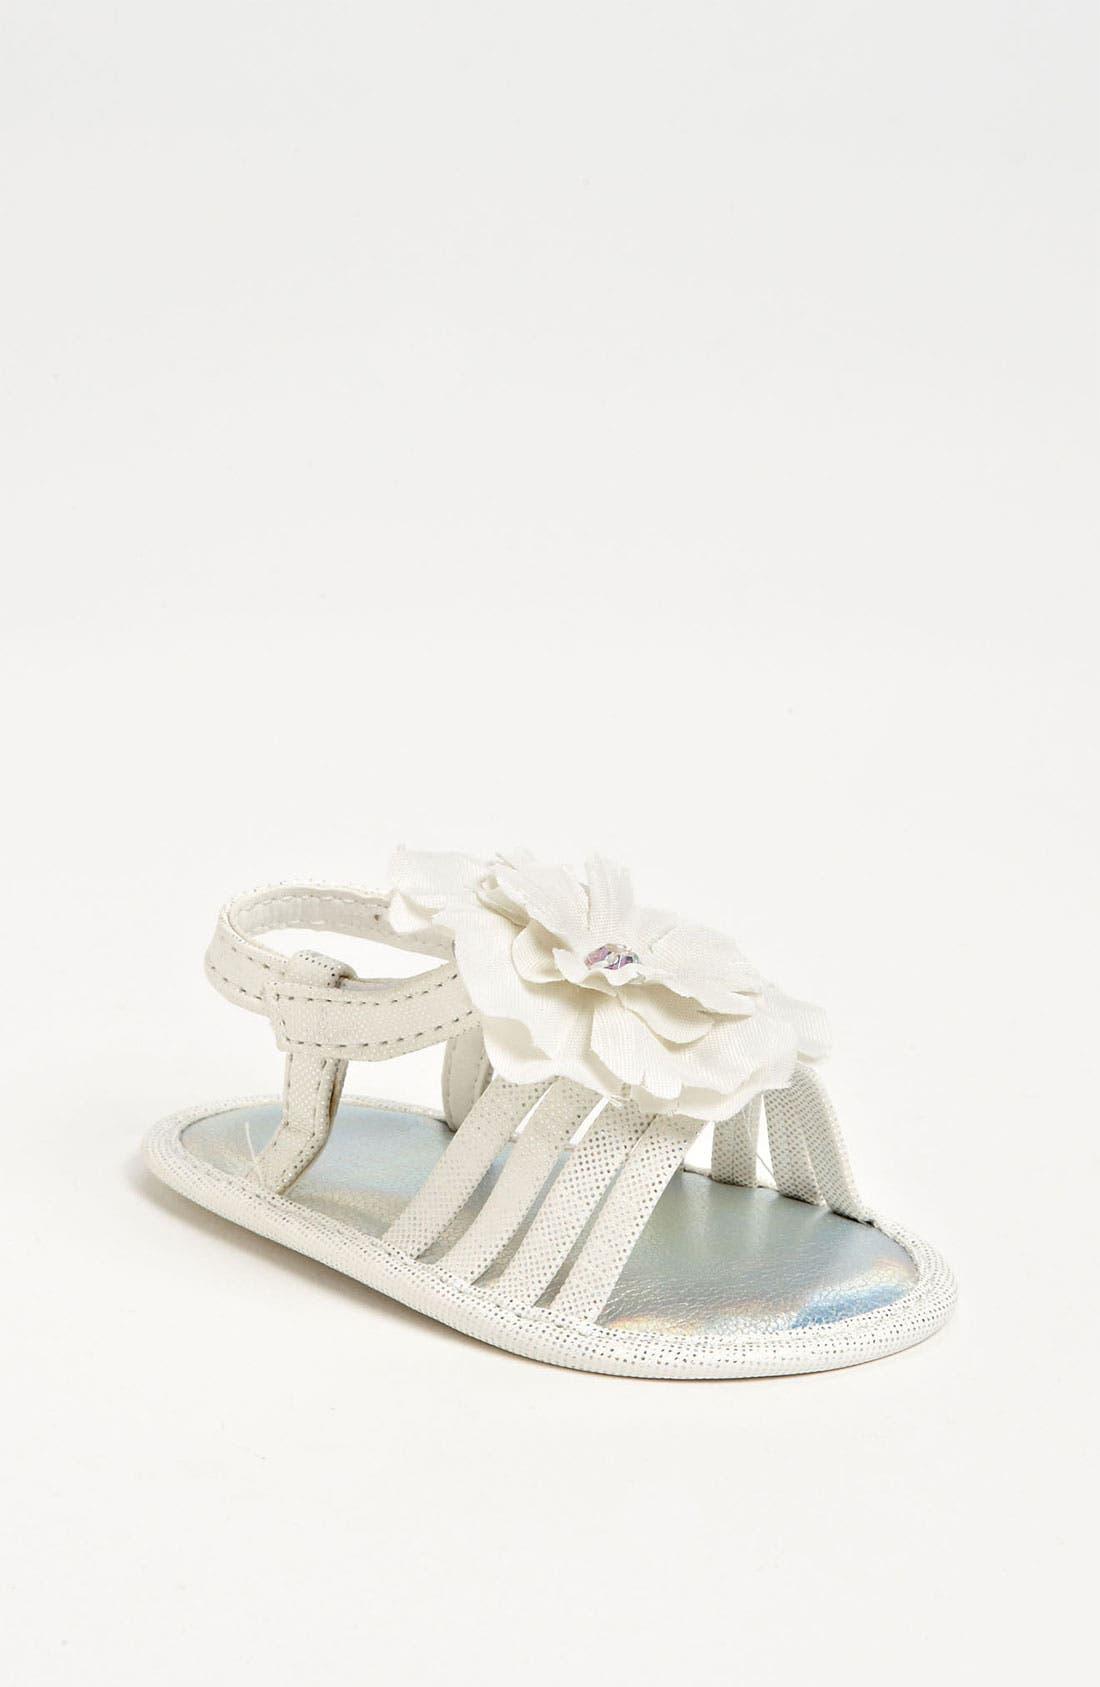 Alternate Image 1 Selected - Stuart Weitzman 'Babybuddy' Sandal (Baby)